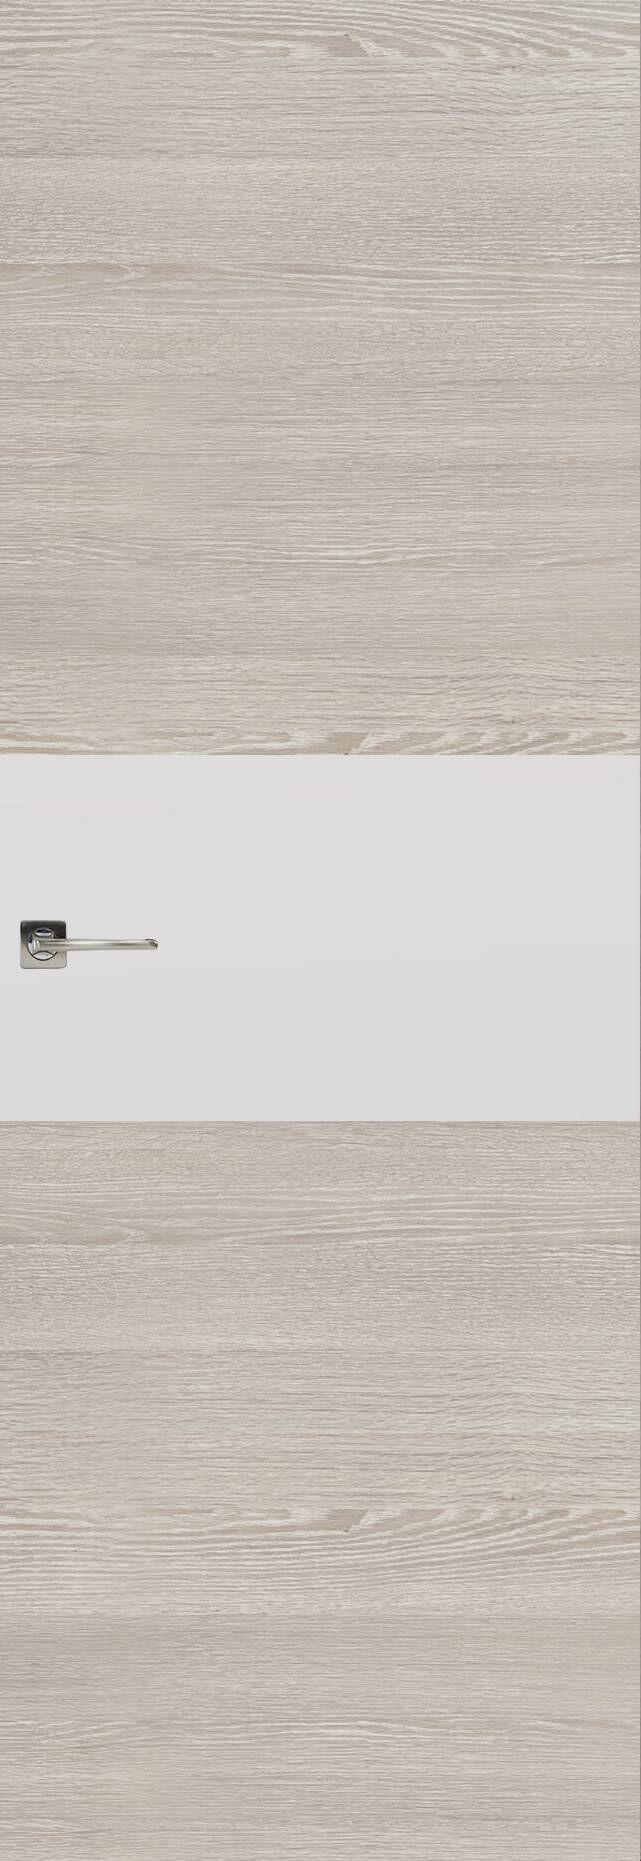 Tivoli Е-4 Невидимка цвет - Серый дуб Без стекла (ДГ)